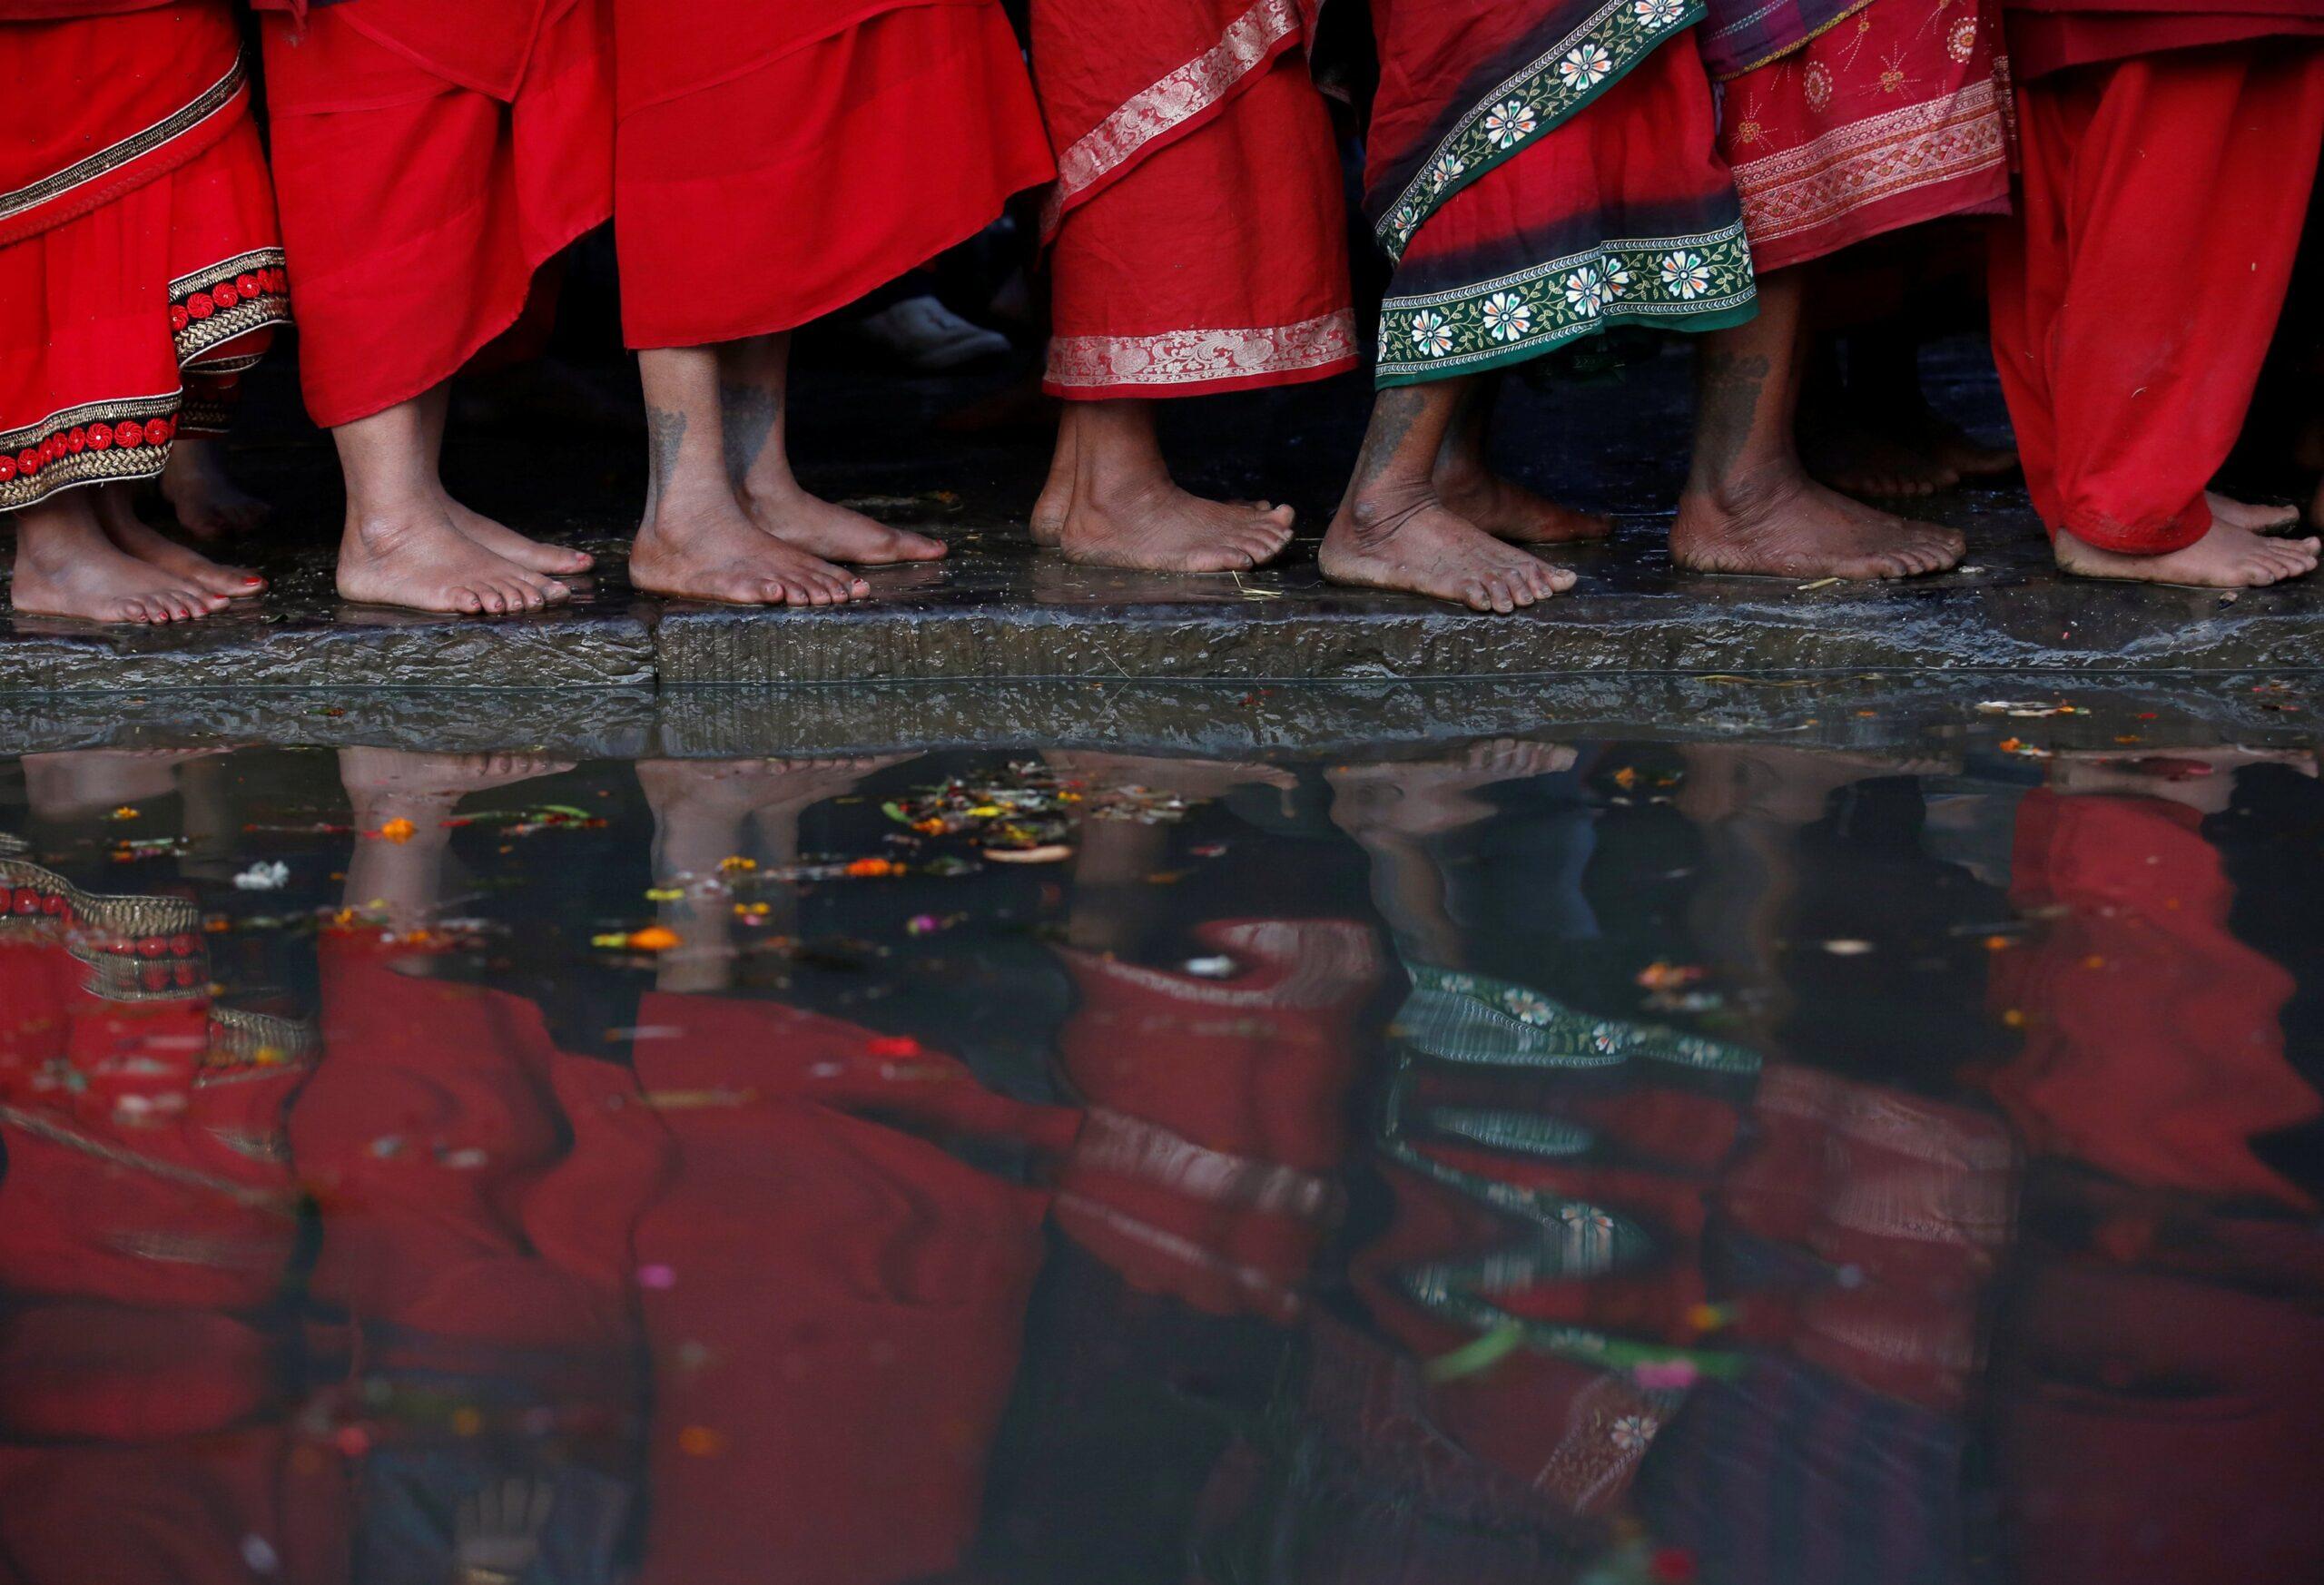 Swasthani Barta (1 month long fast ceremony) image